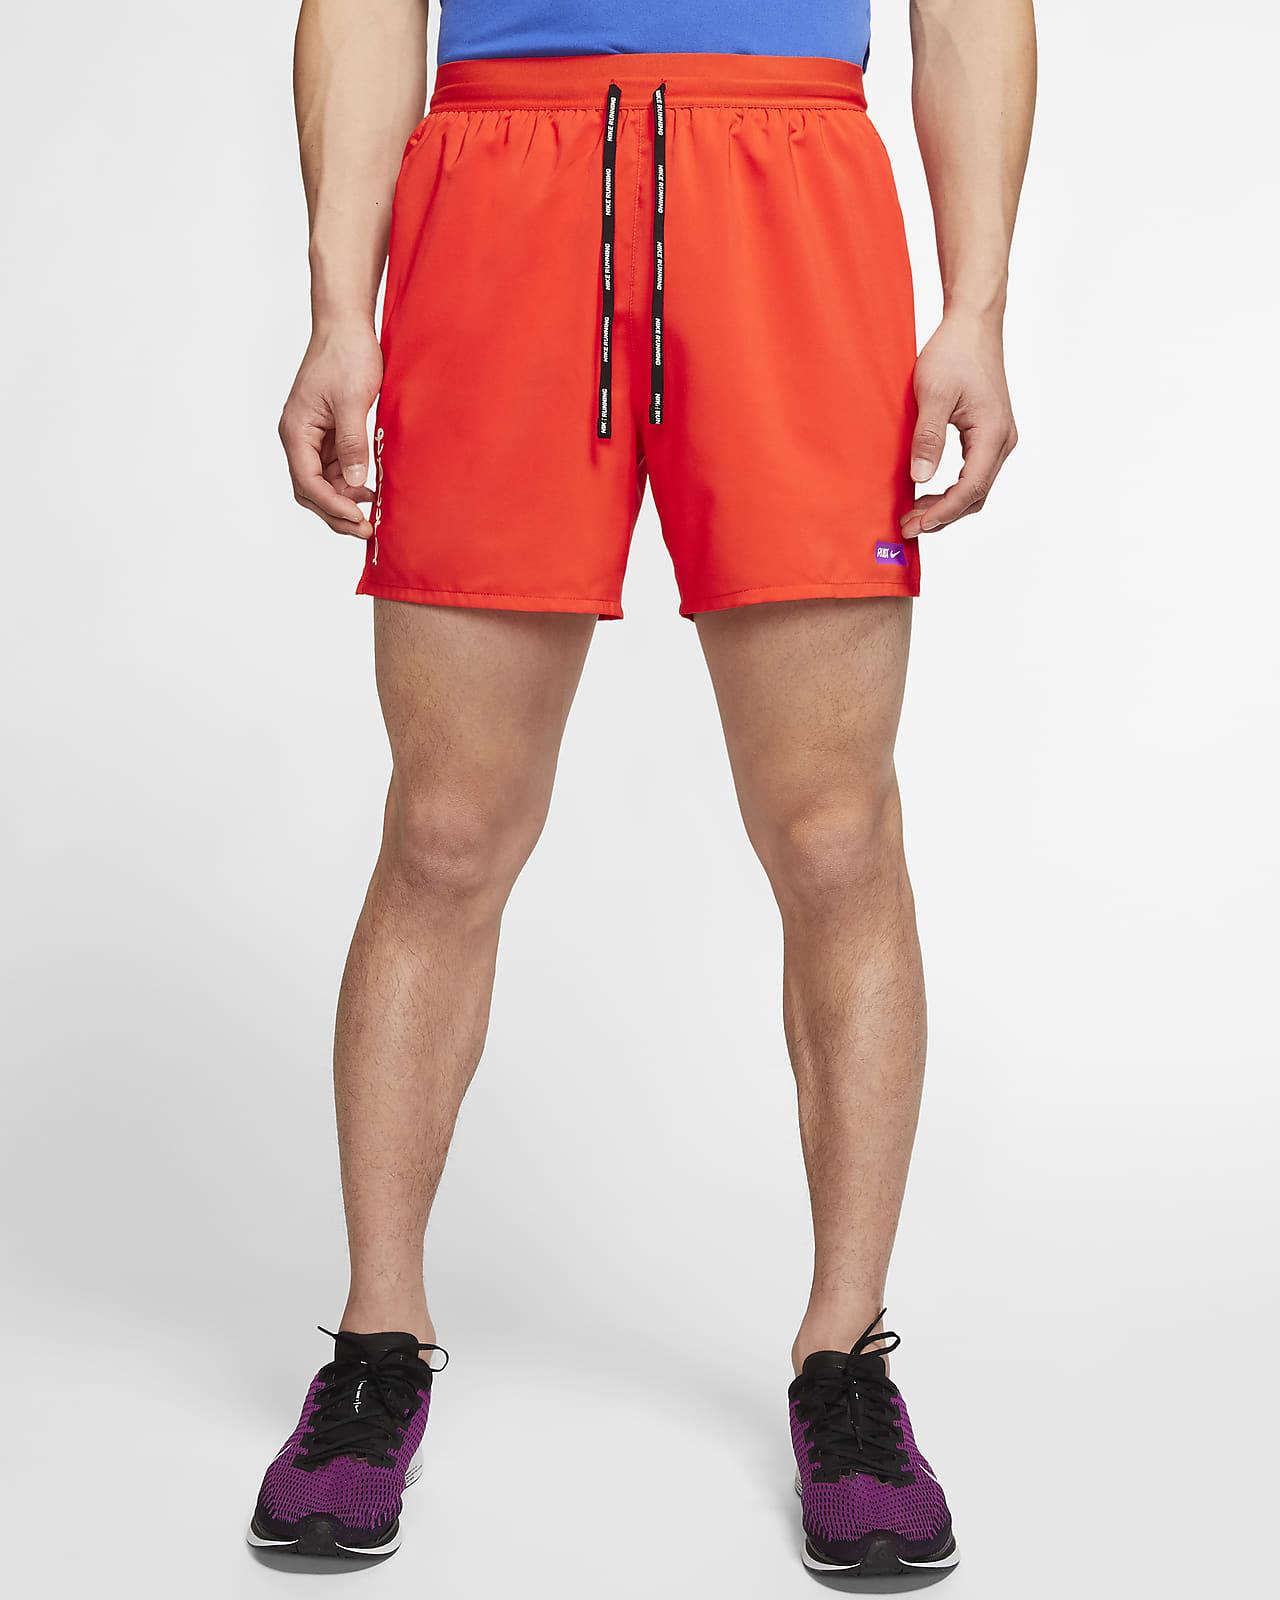 Nike Flex Stride Men's 13cm (approx.) Running Shorts